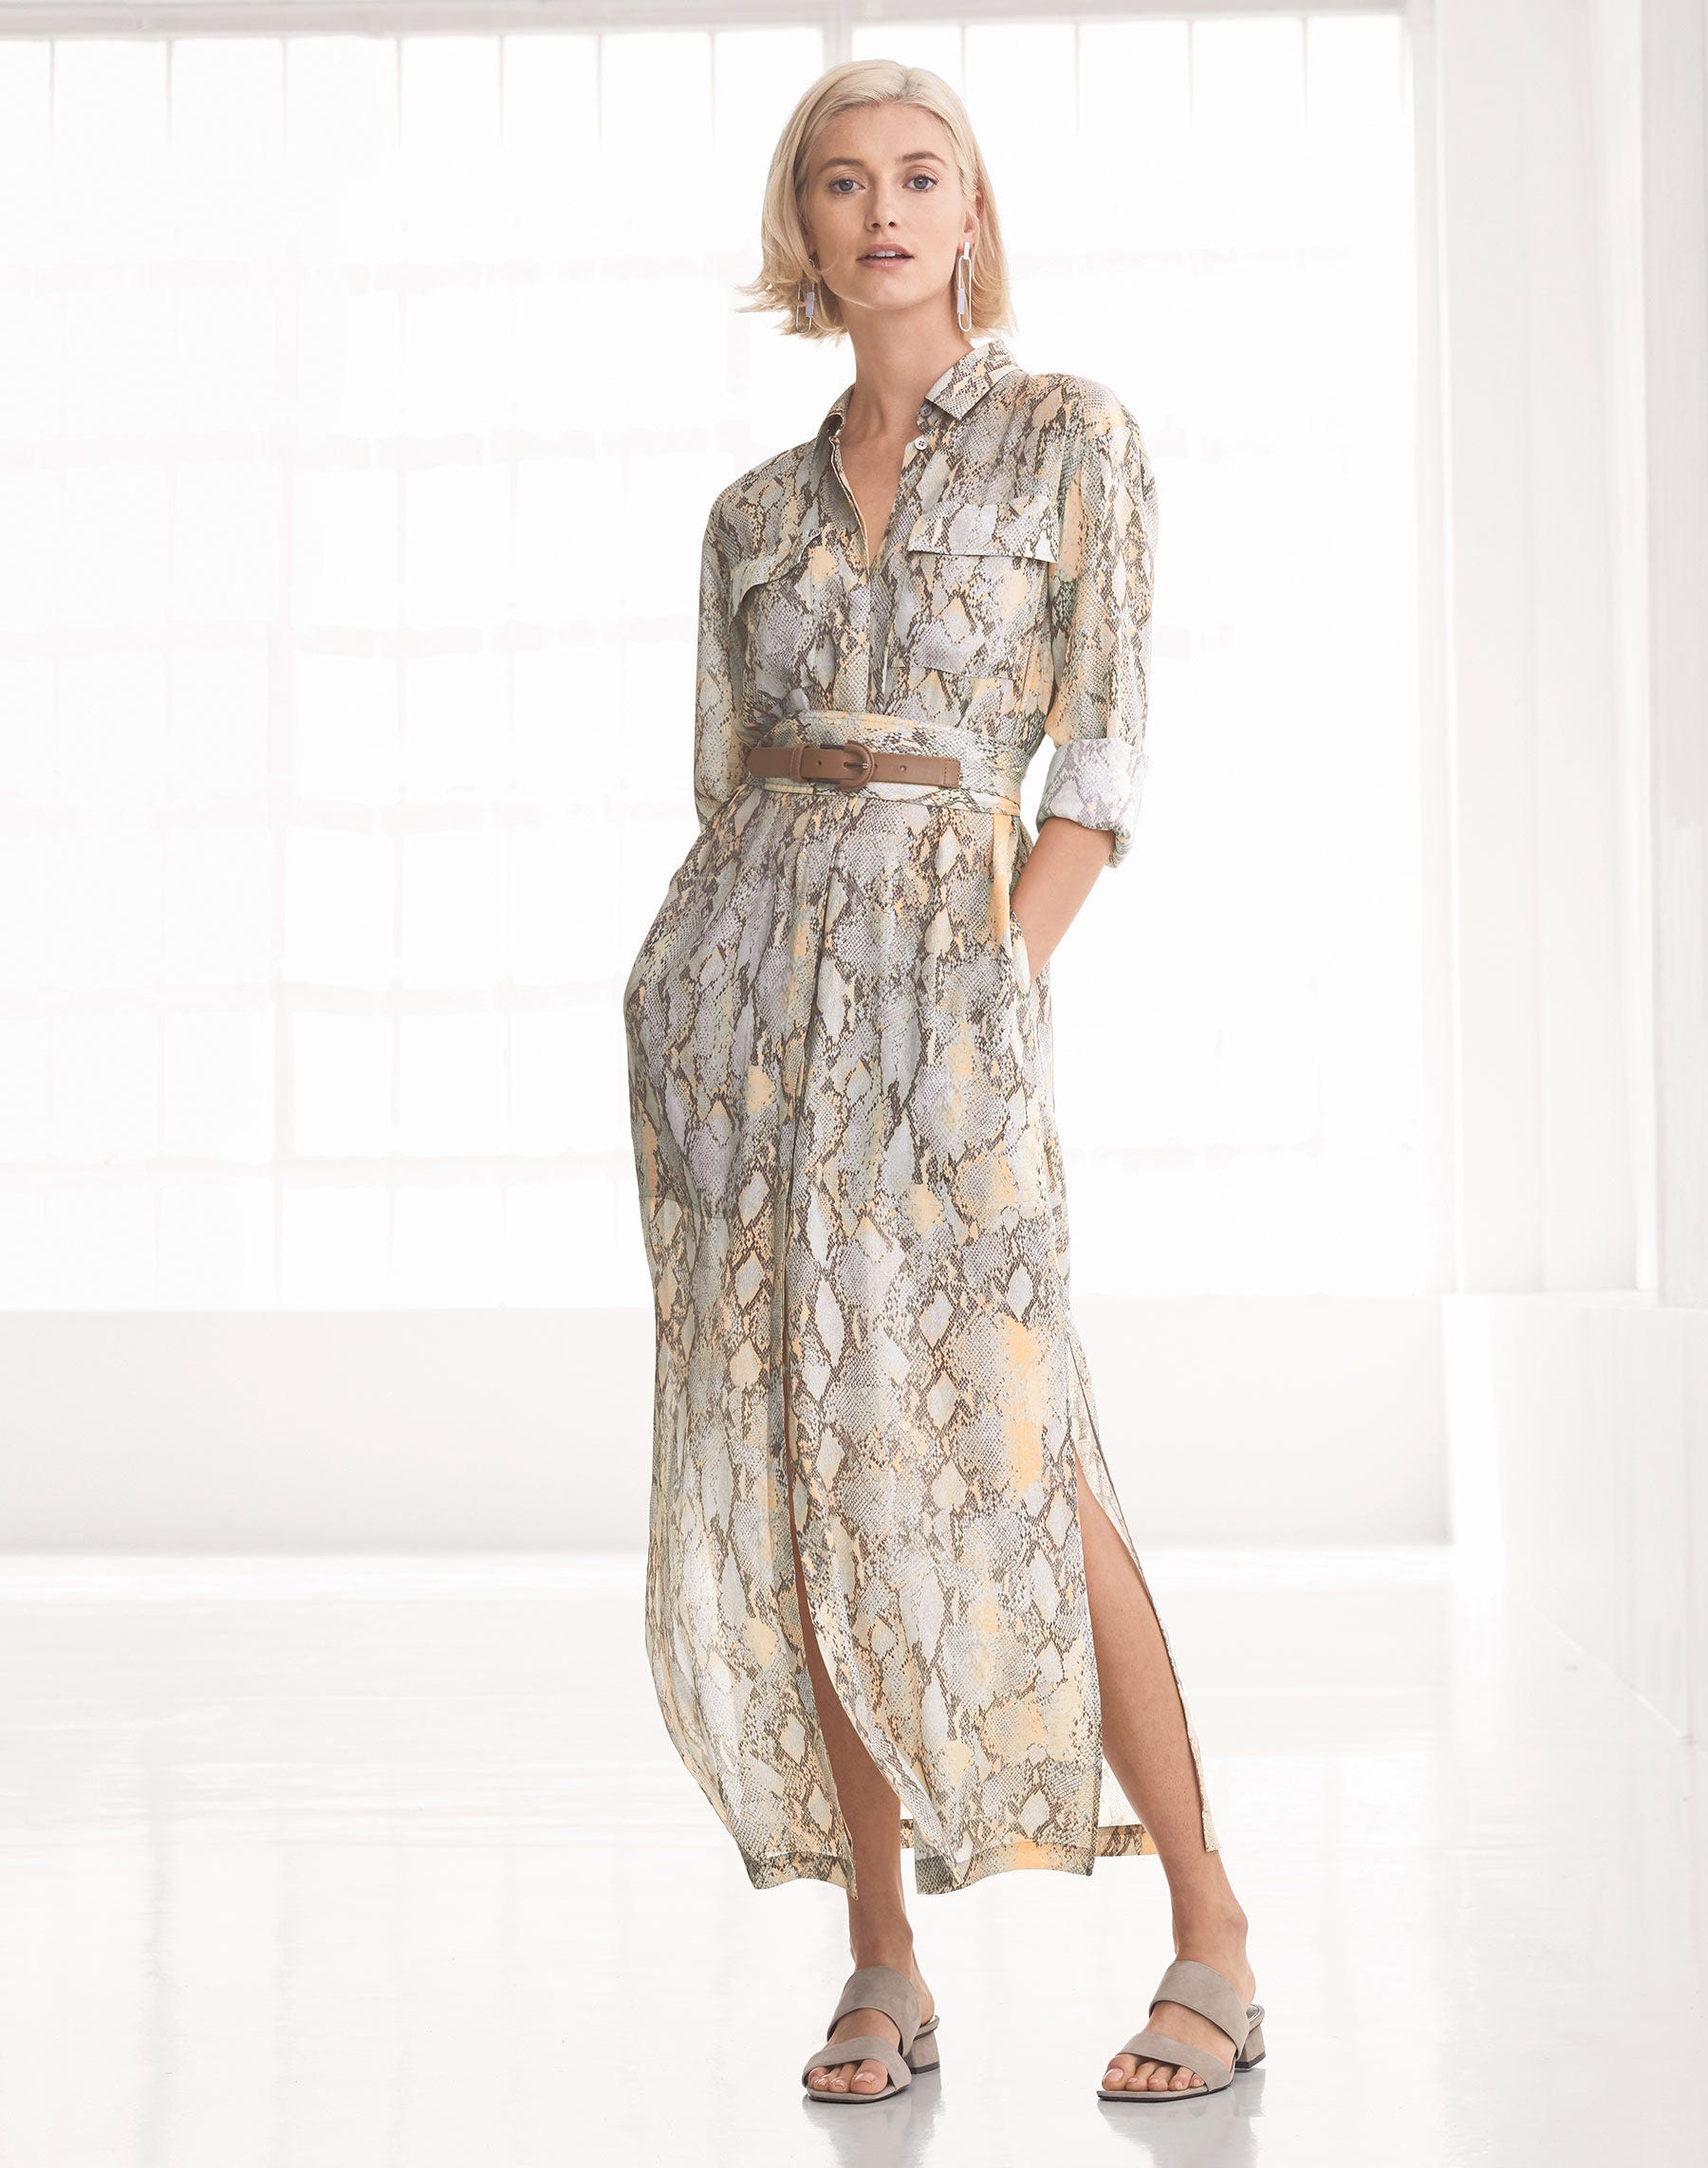 38ea552f81f1 New Arrivals & Styles - New York Fashion | Lafayette 148 New York